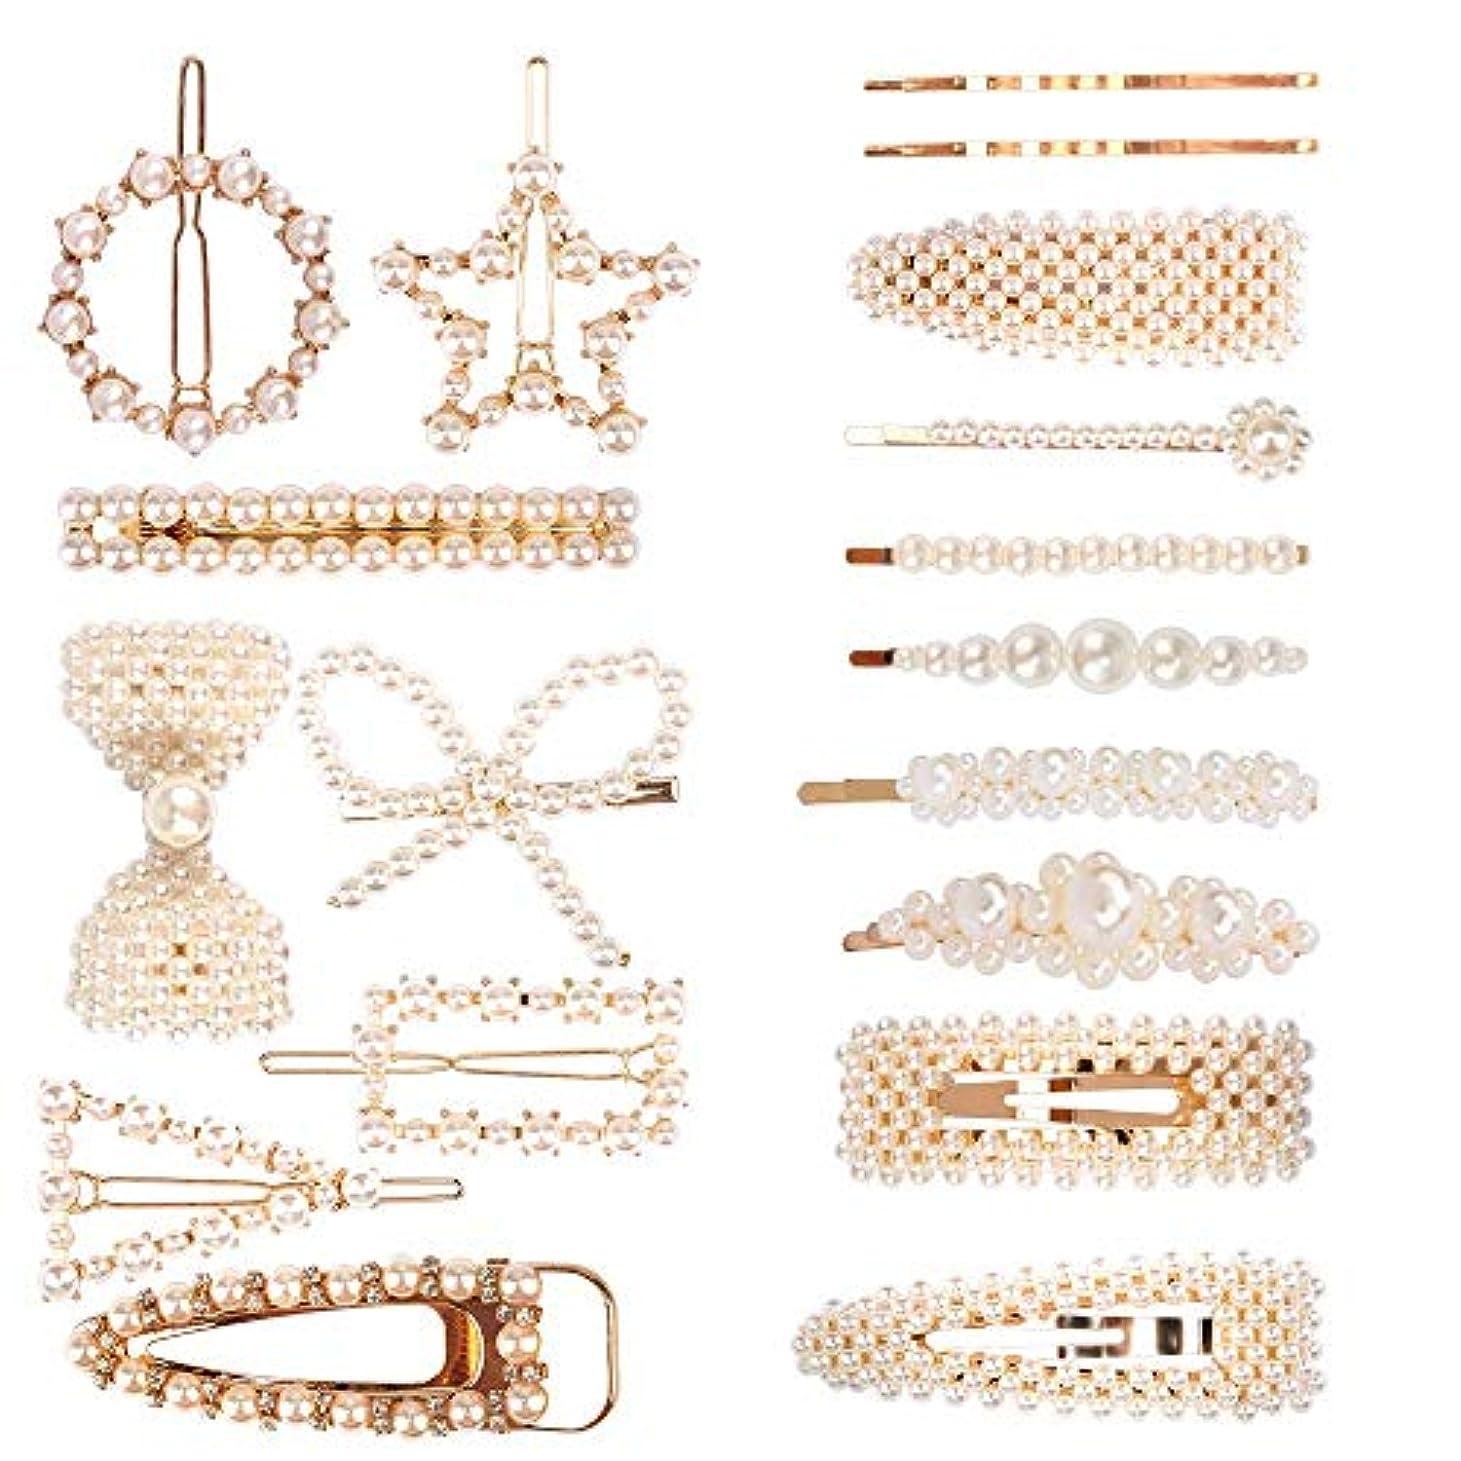 ACO-UINT 18パック 樹脂ヘアピン ヘアクリップ ヘアアクセサリー ファッシヨンスウイートスタイリング 人工 真珠アクセサリー ヘアクリップミニ レデスース向け